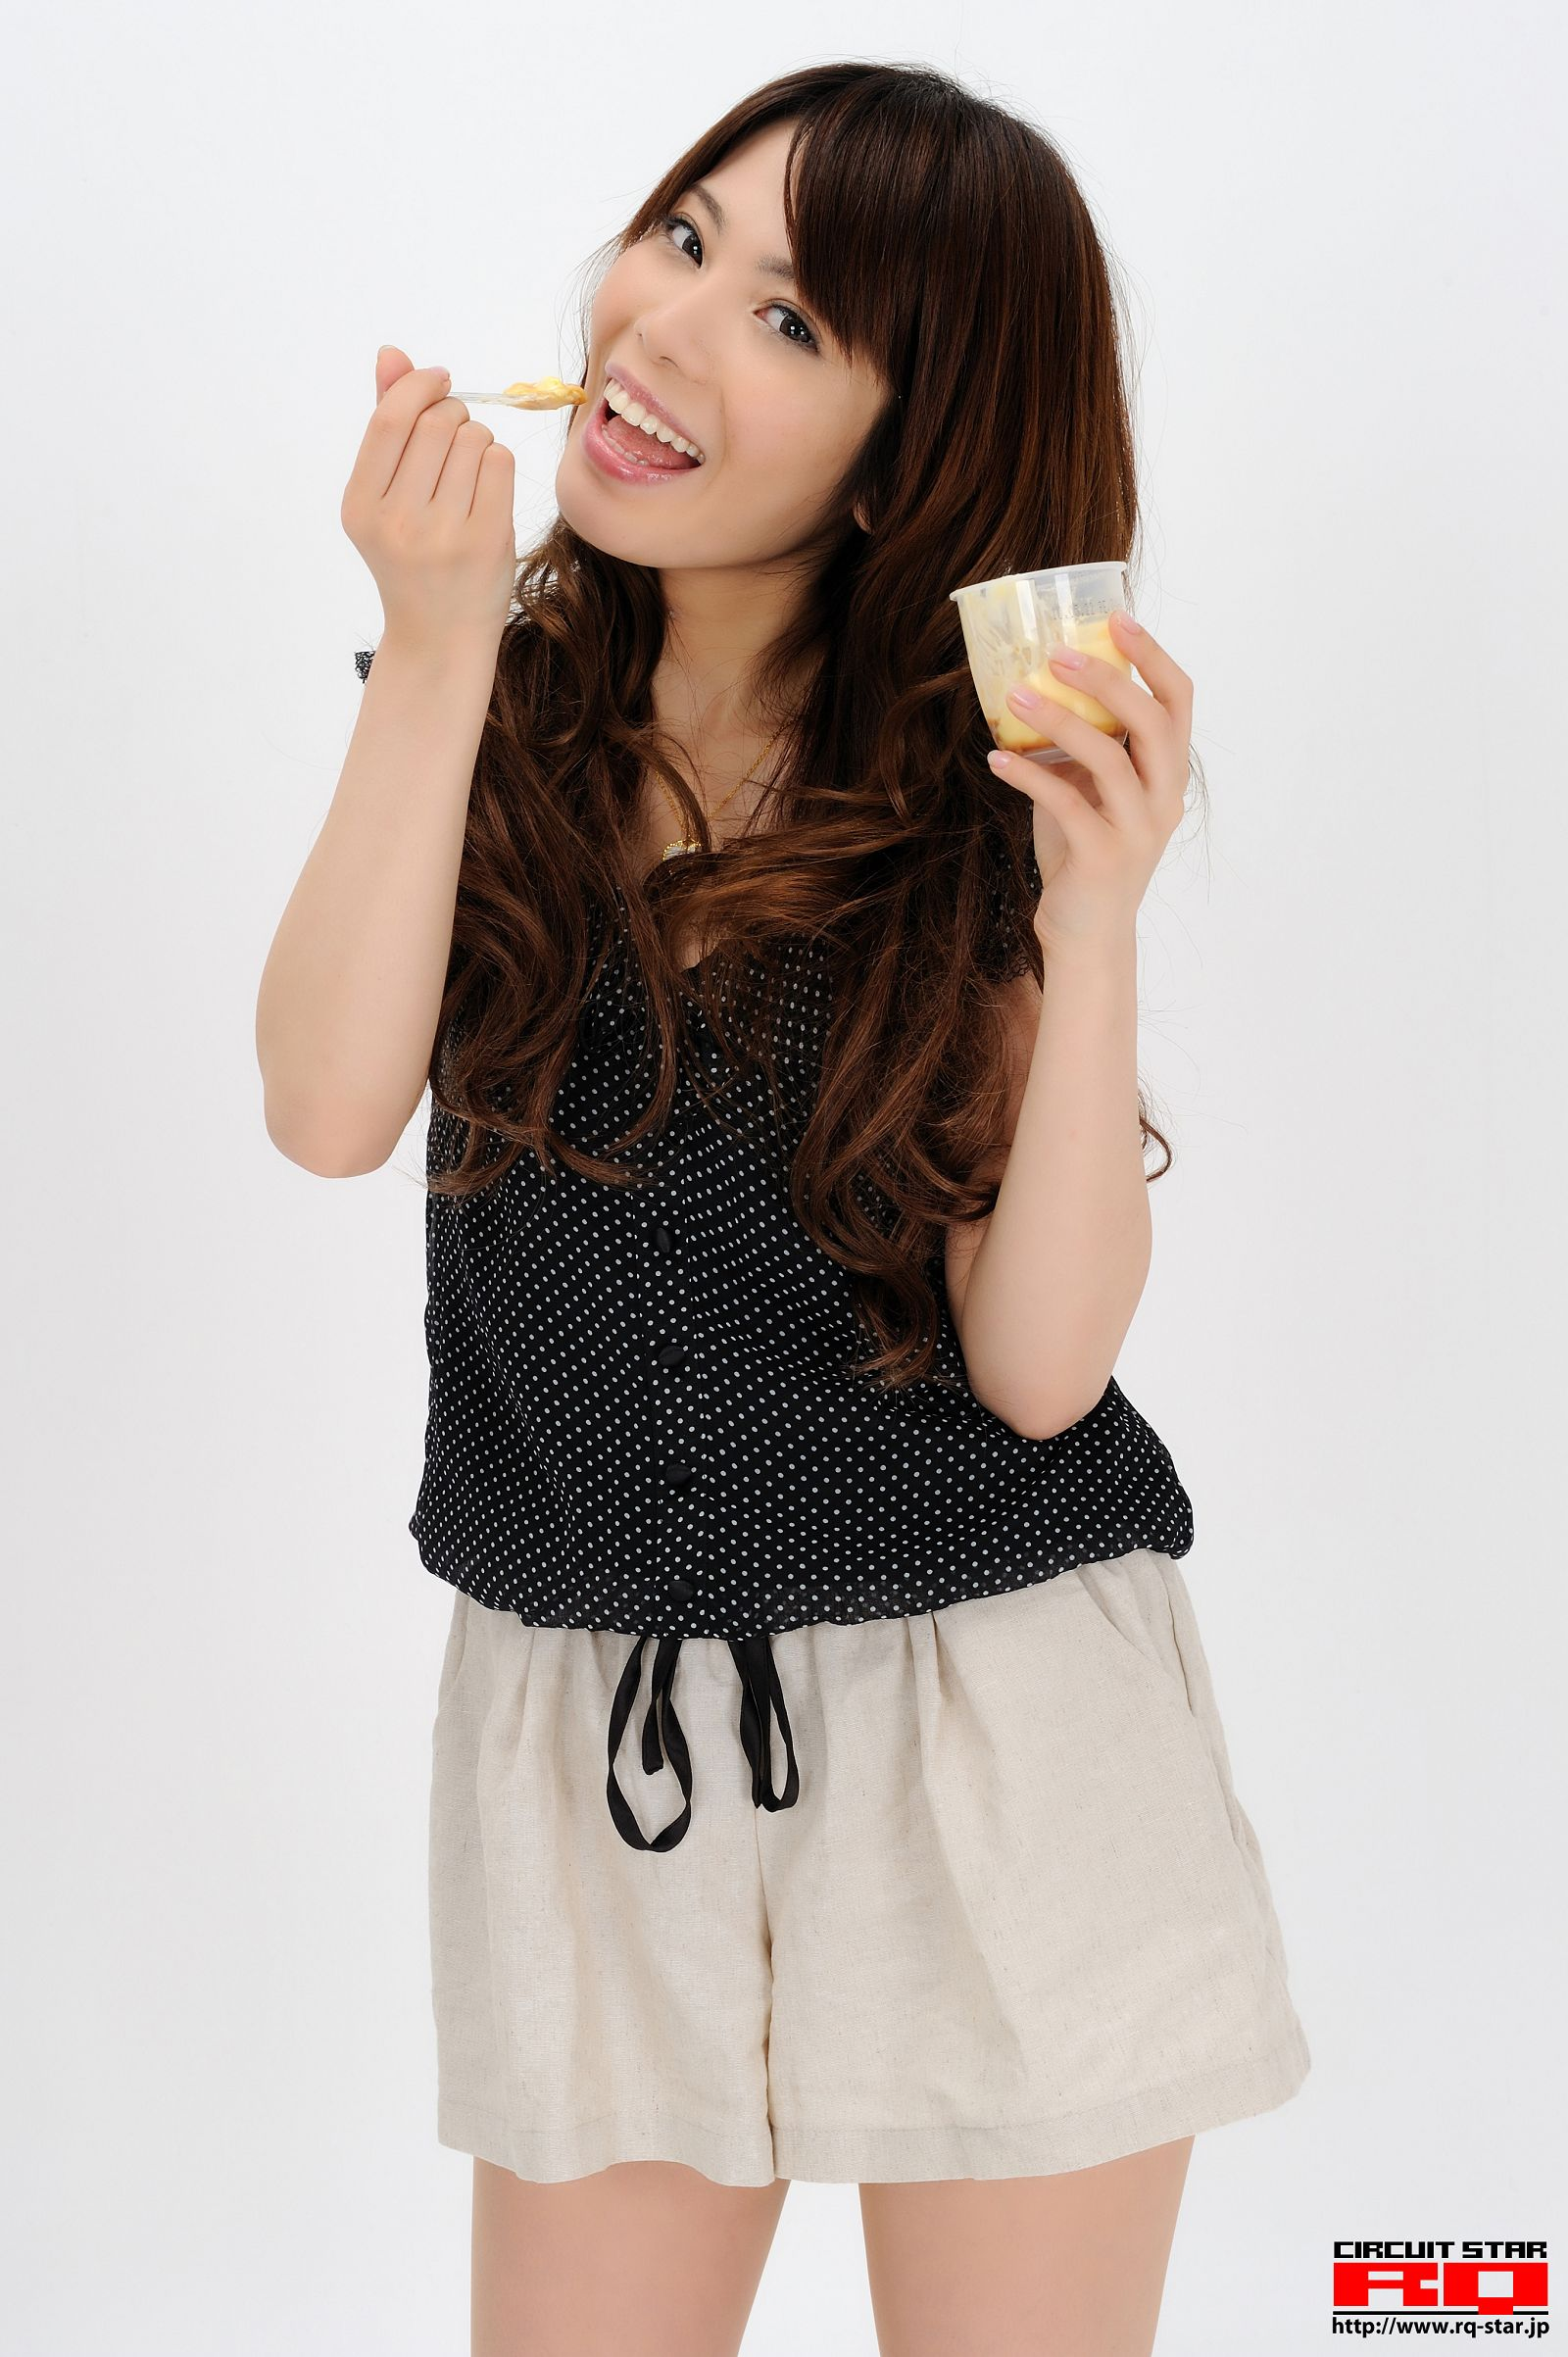 [RQ STAR美女] NO.0291 Takana Honda 本田貴奈 Private Dress[80P] RQ STAR 第3张